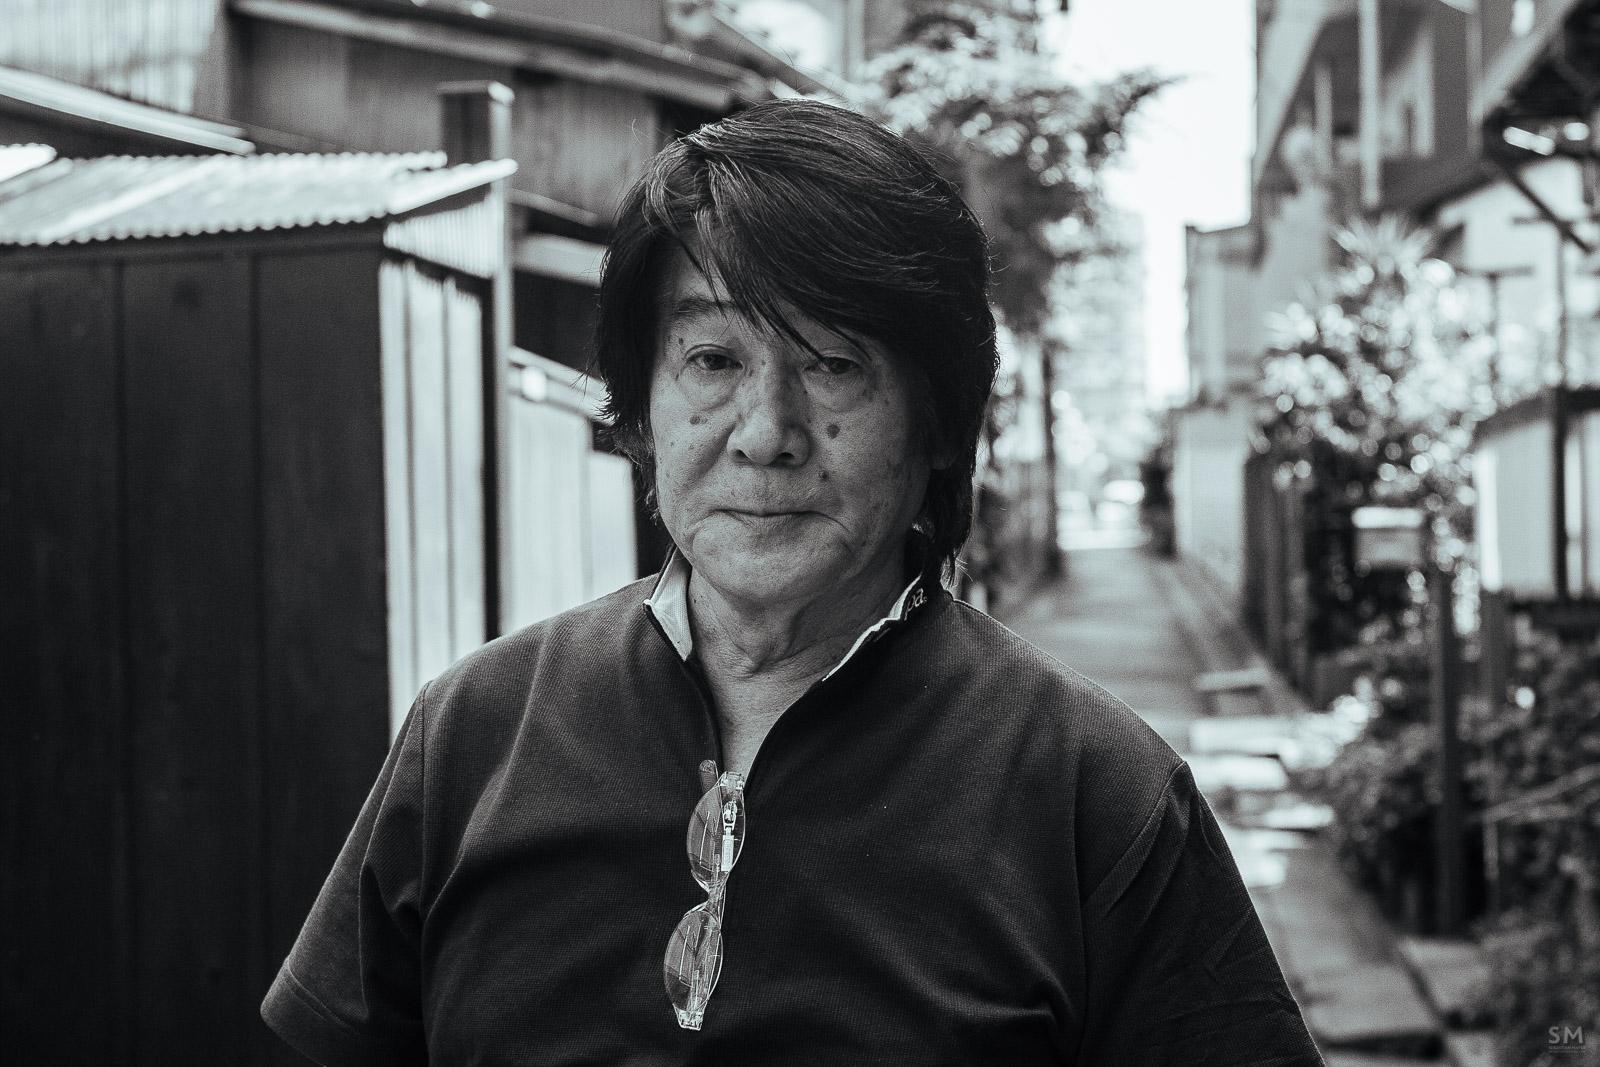 Image of Daido Moriyama from Wikidata